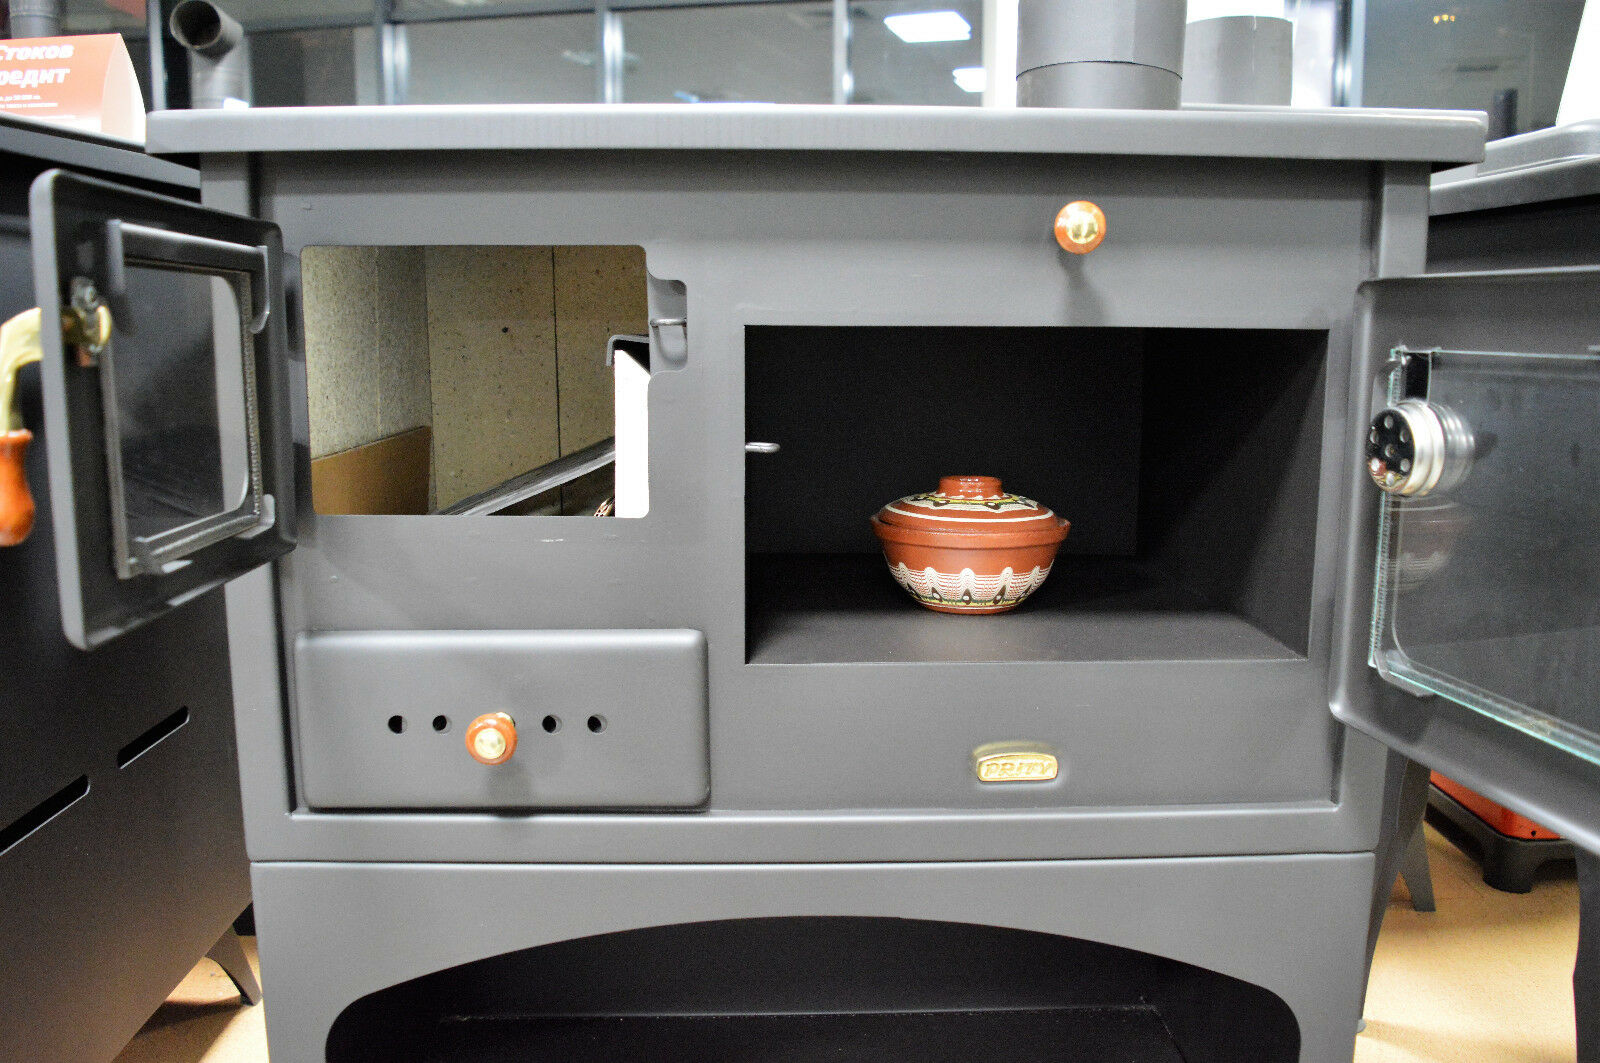 holz verbrennung gusseisen top feste brennstoffe kochen herd kamin mit 10 kw ebay. Black Bedroom Furniture Sets. Home Design Ideas